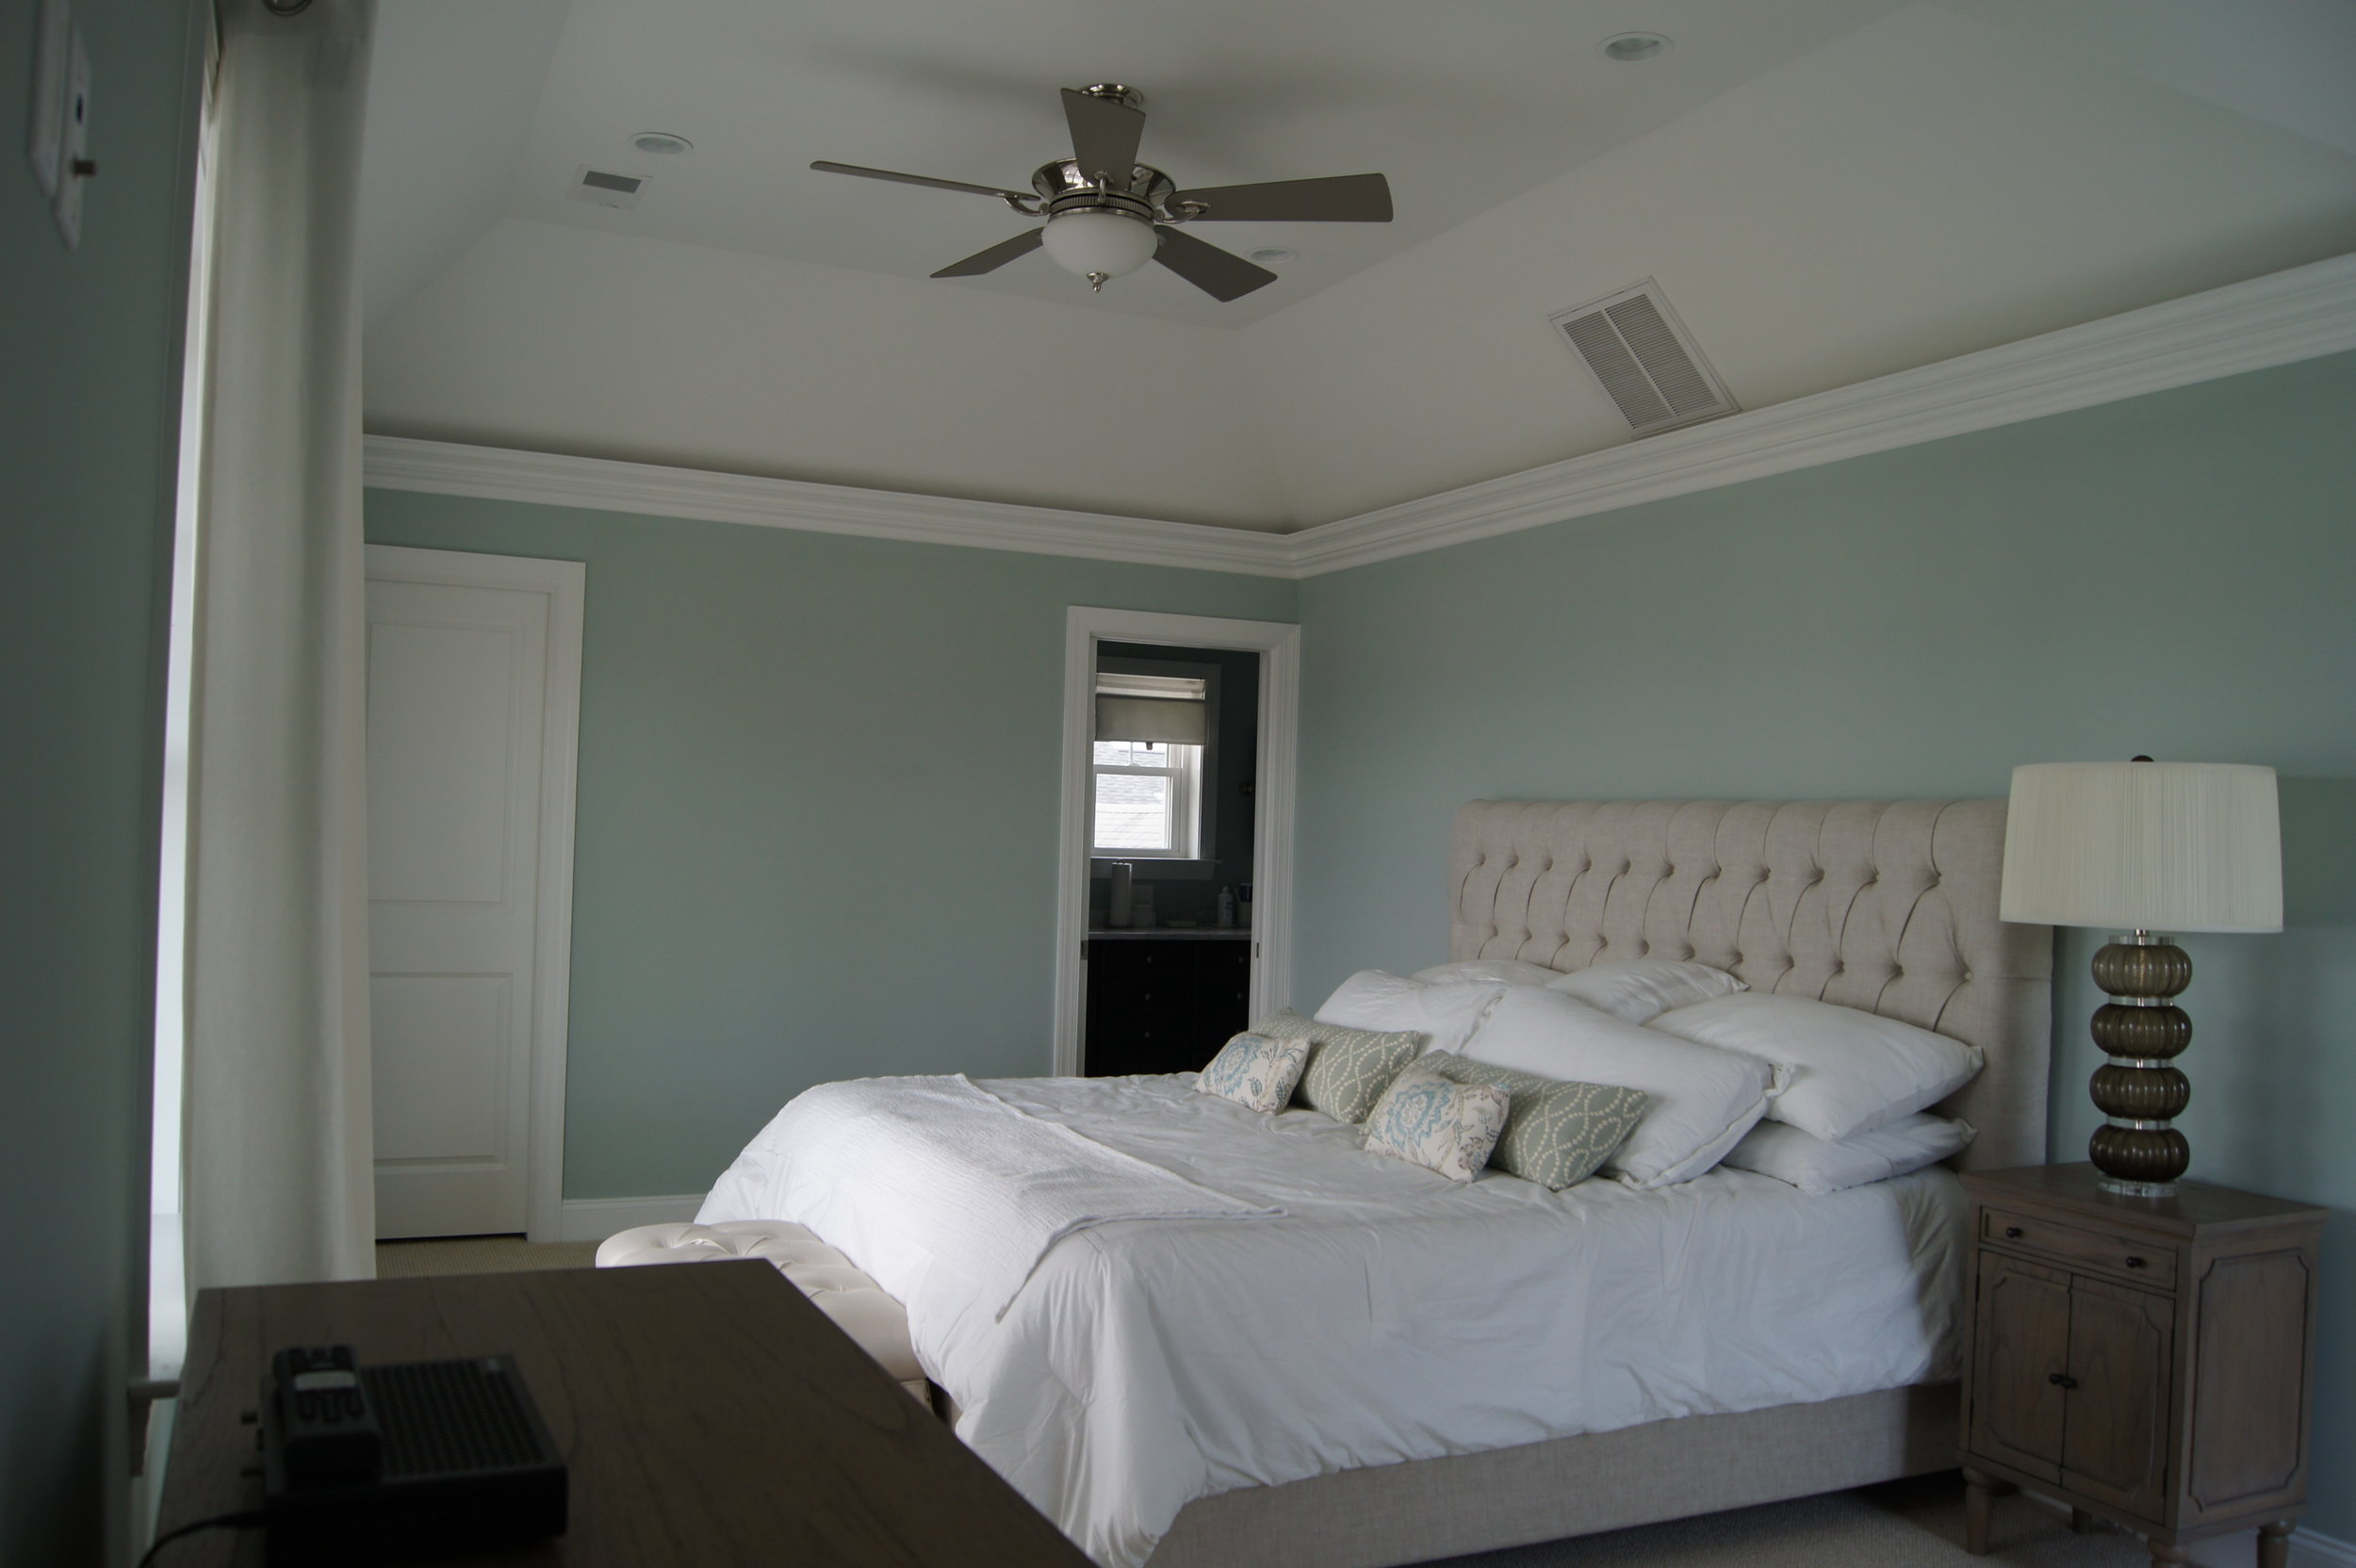 3221 bed 3.JPG